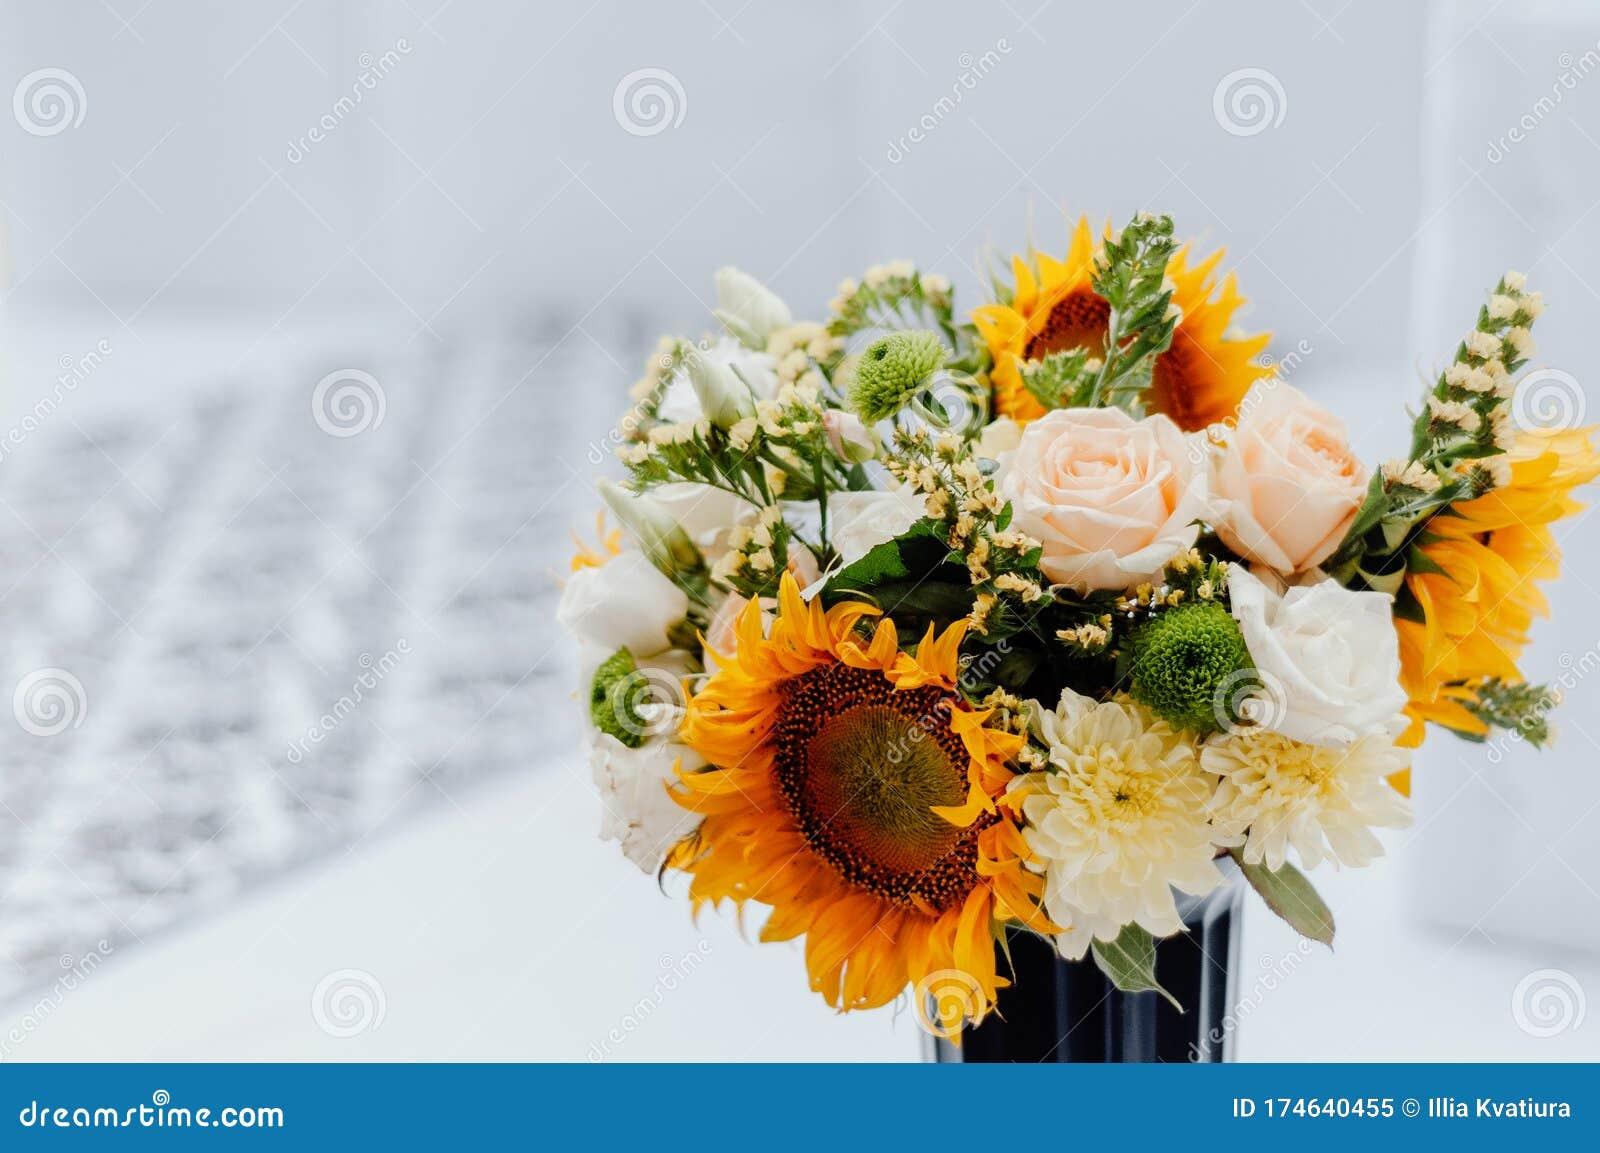 Flower Arrangement In A Black Vase Stock Image Image Of White Love 174640455